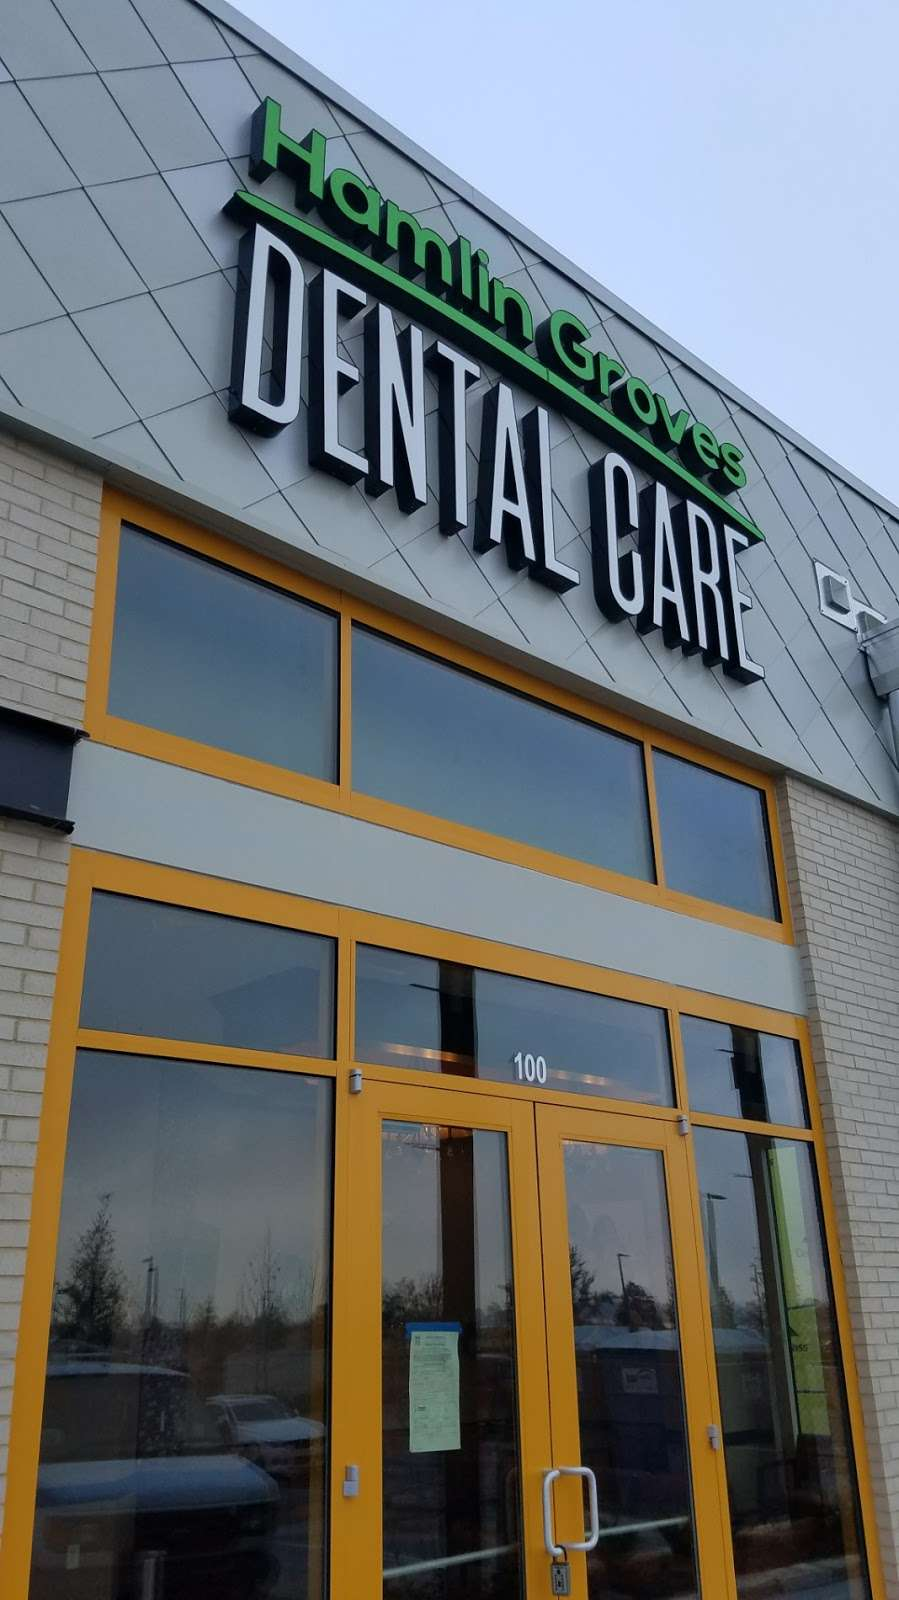 Hamlin Groves Dental Care - dentist  | Photo 8 of 10 | Address: 16412 New Independence Pkwy Ste 100, Winter Garden, FL 34787, USA | Phone: (407) 554-2335